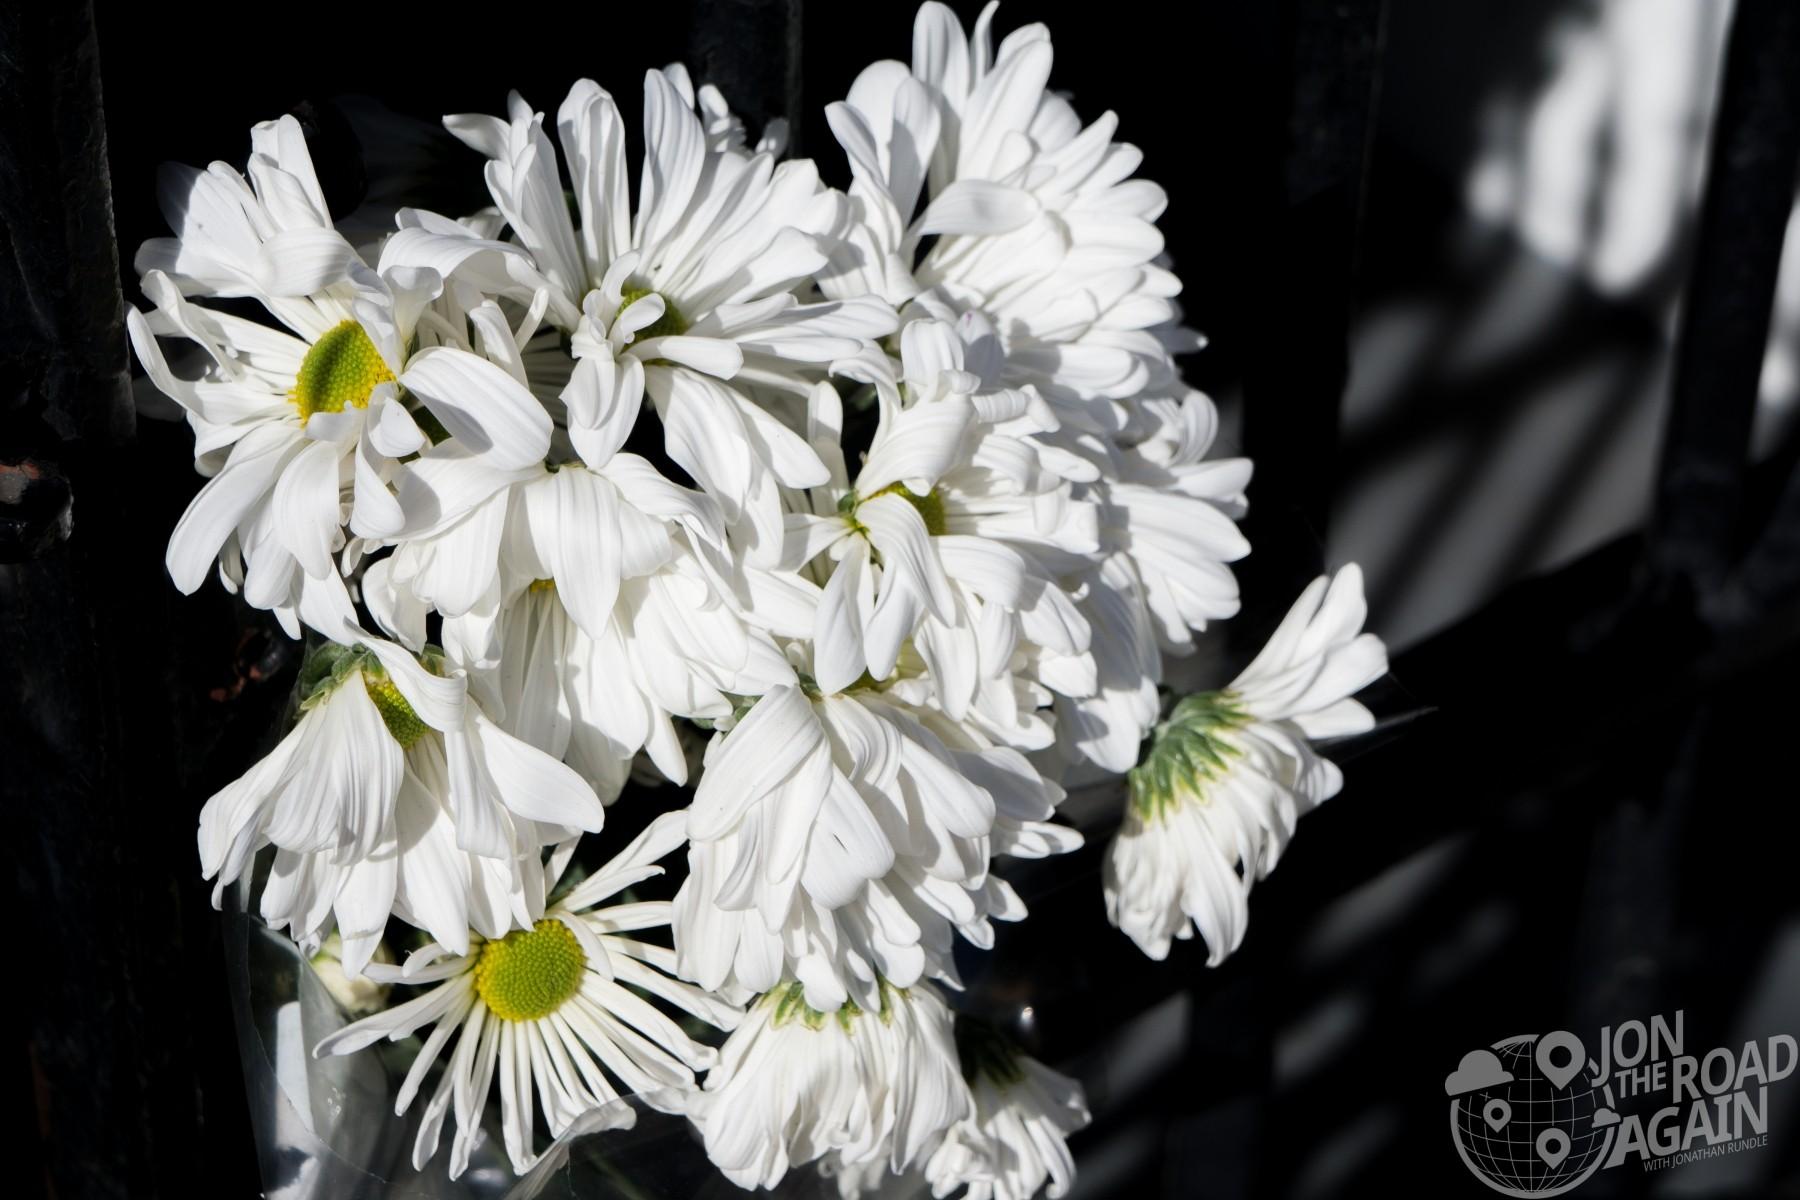 Flowers at Emanuel African Methodist Episcopal Church